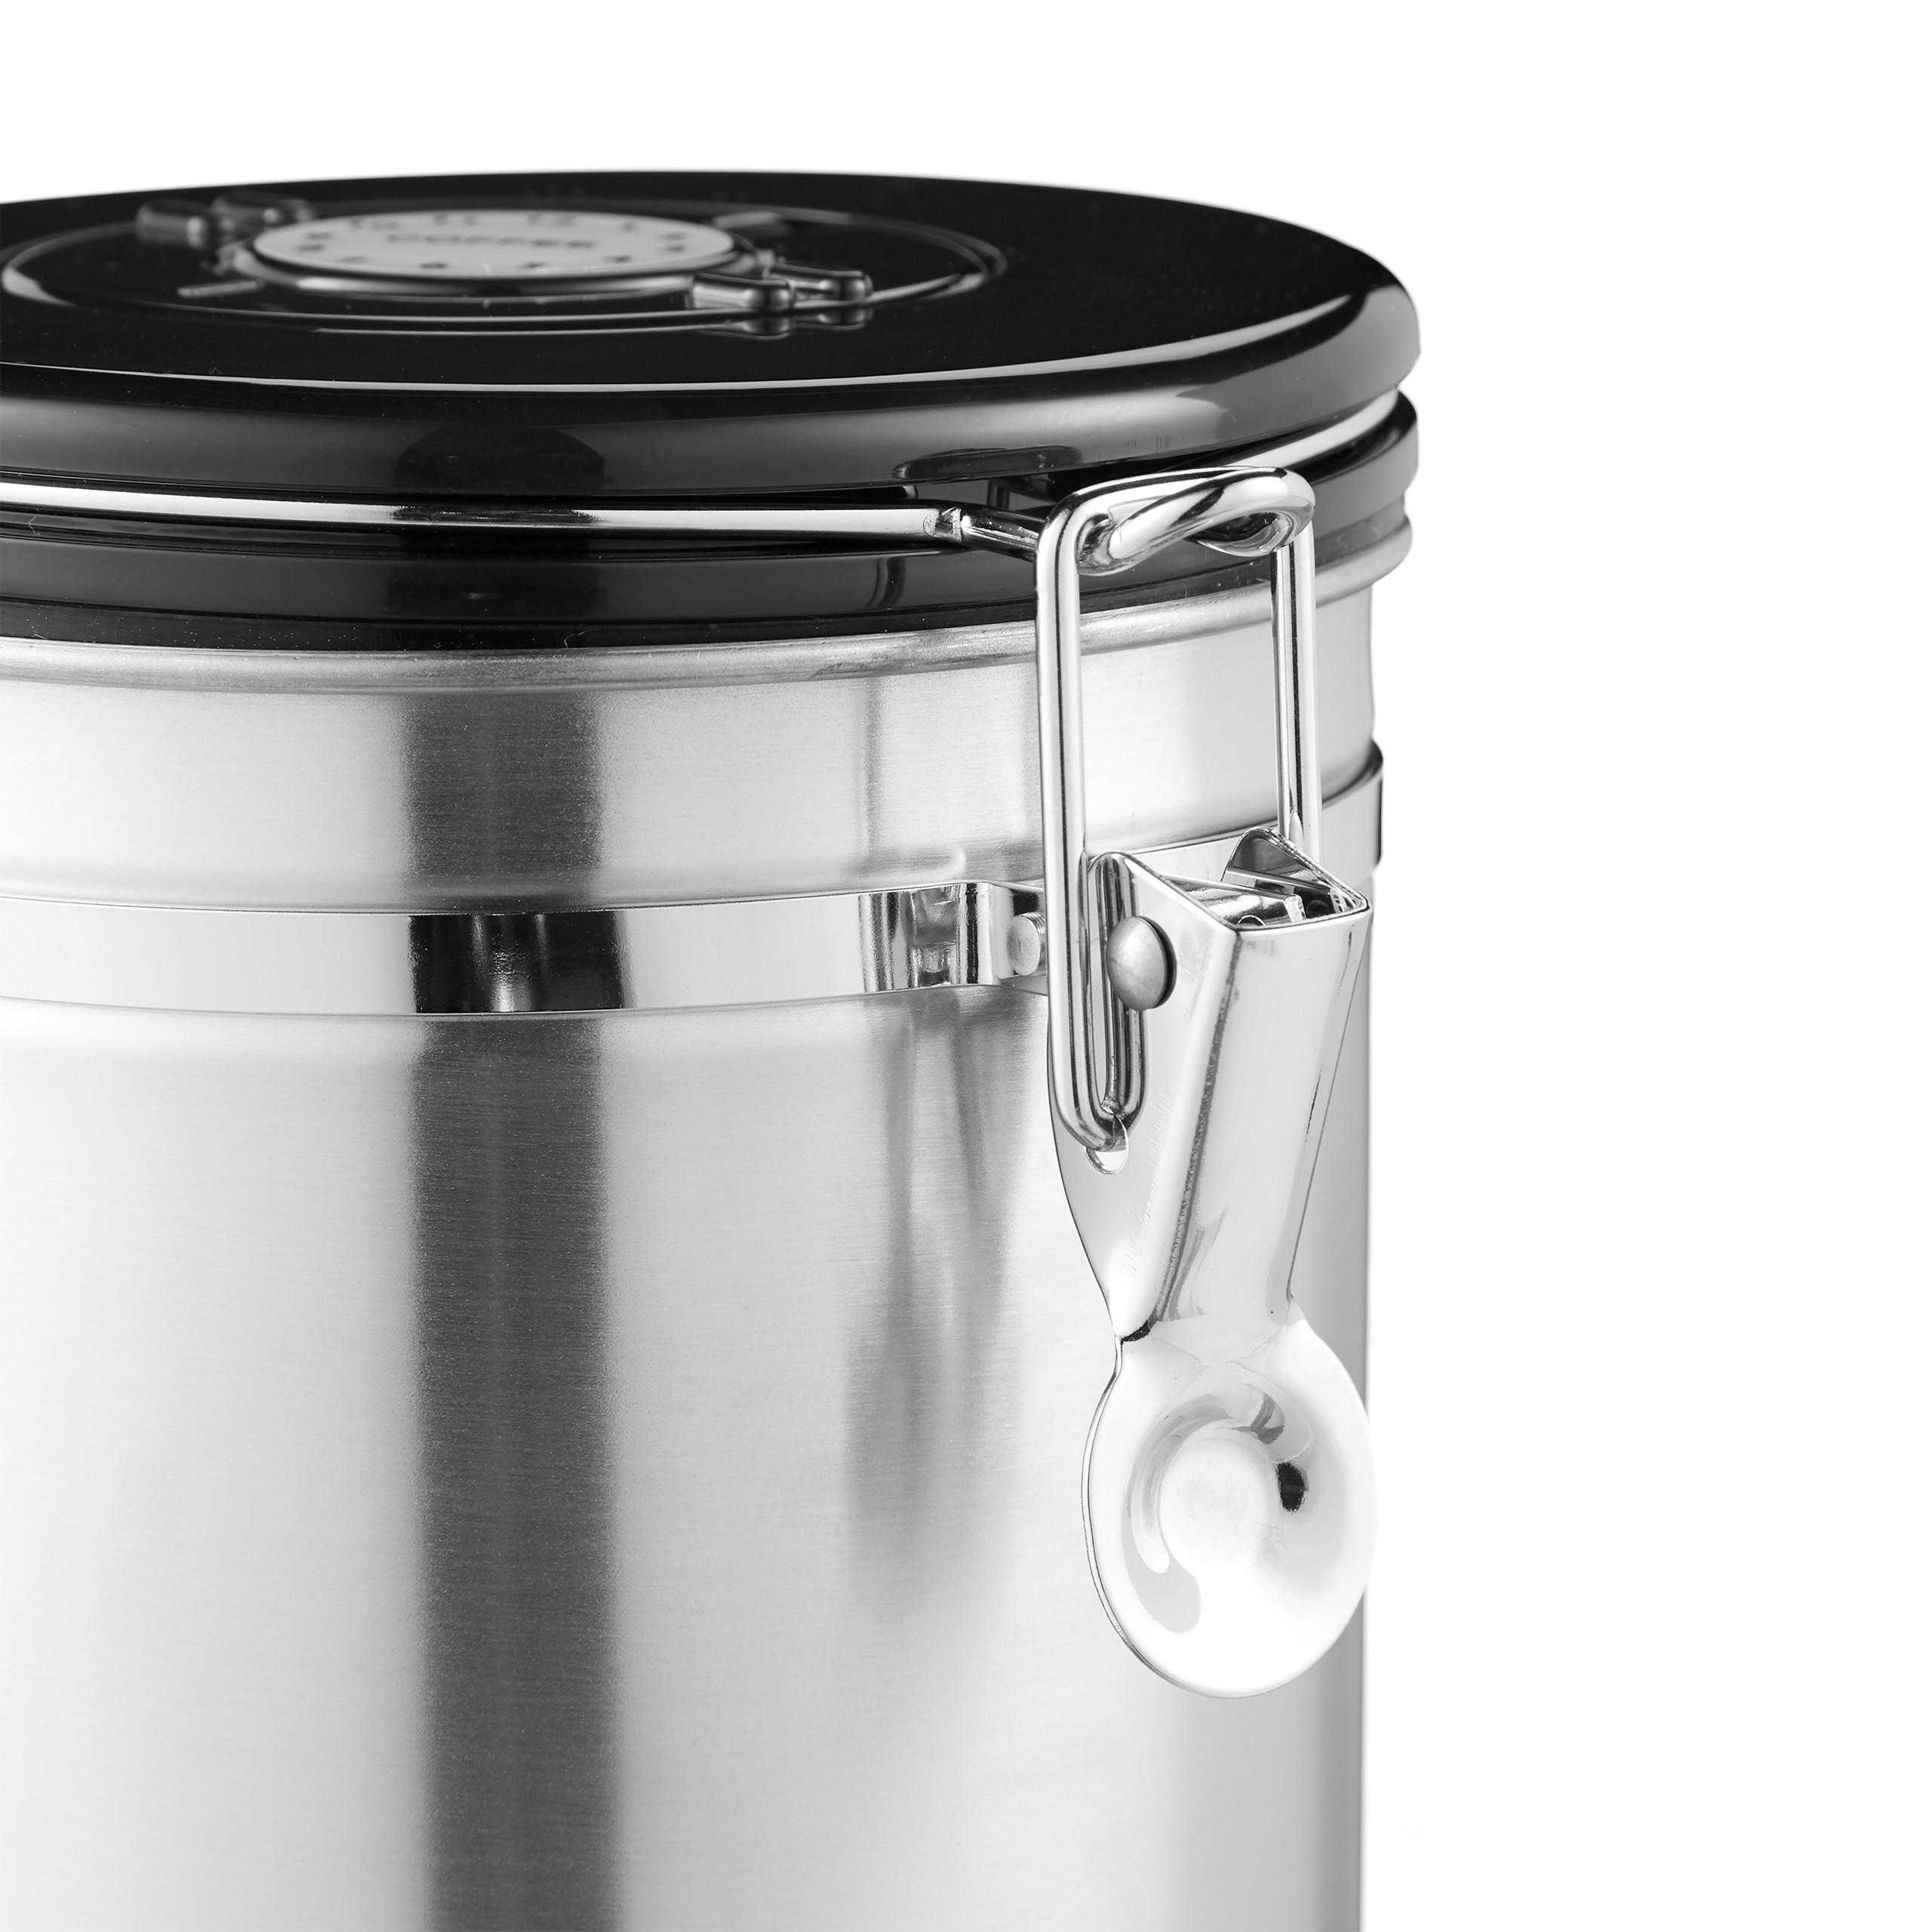 Kaffeedose silber Aromadose Kaffeebehälter Vakuumdose Kaffeepulverdose luftdicht